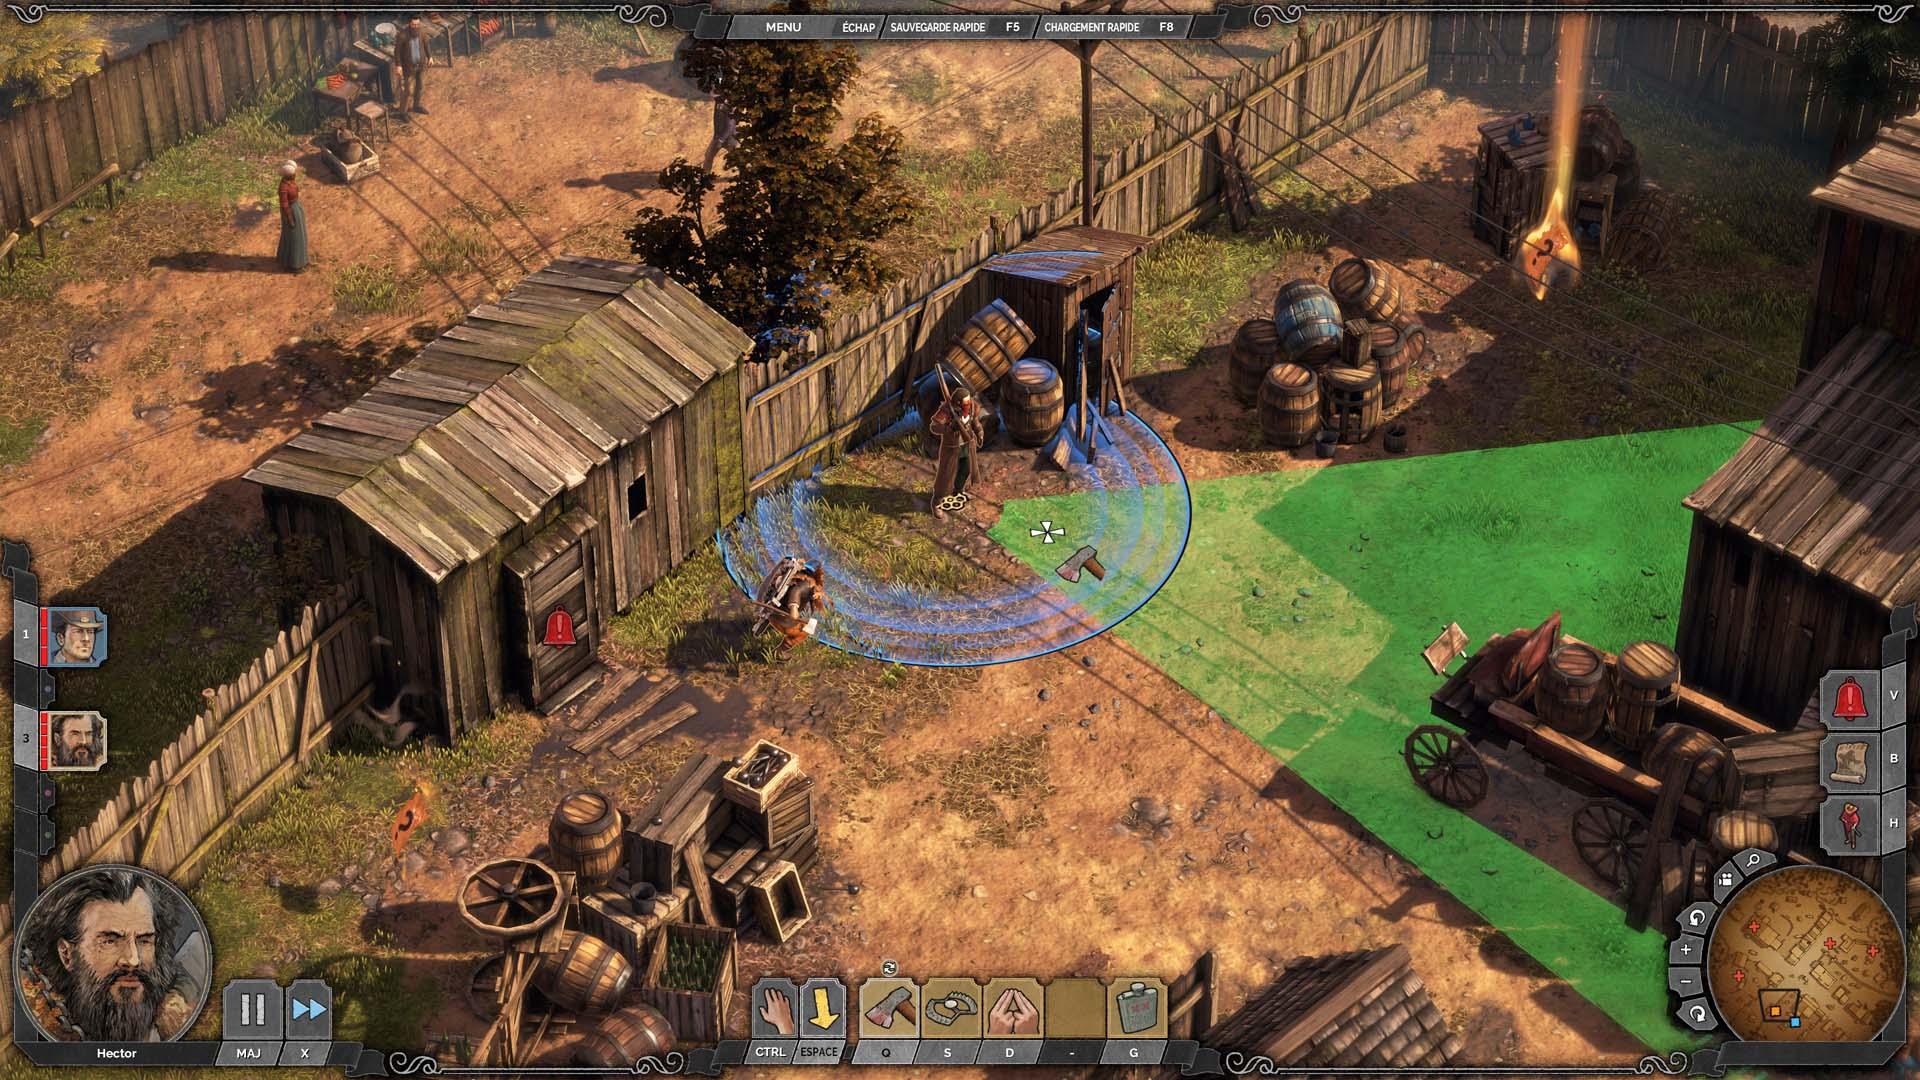 Desperados-Screenshot-Gameblog-Test -1-